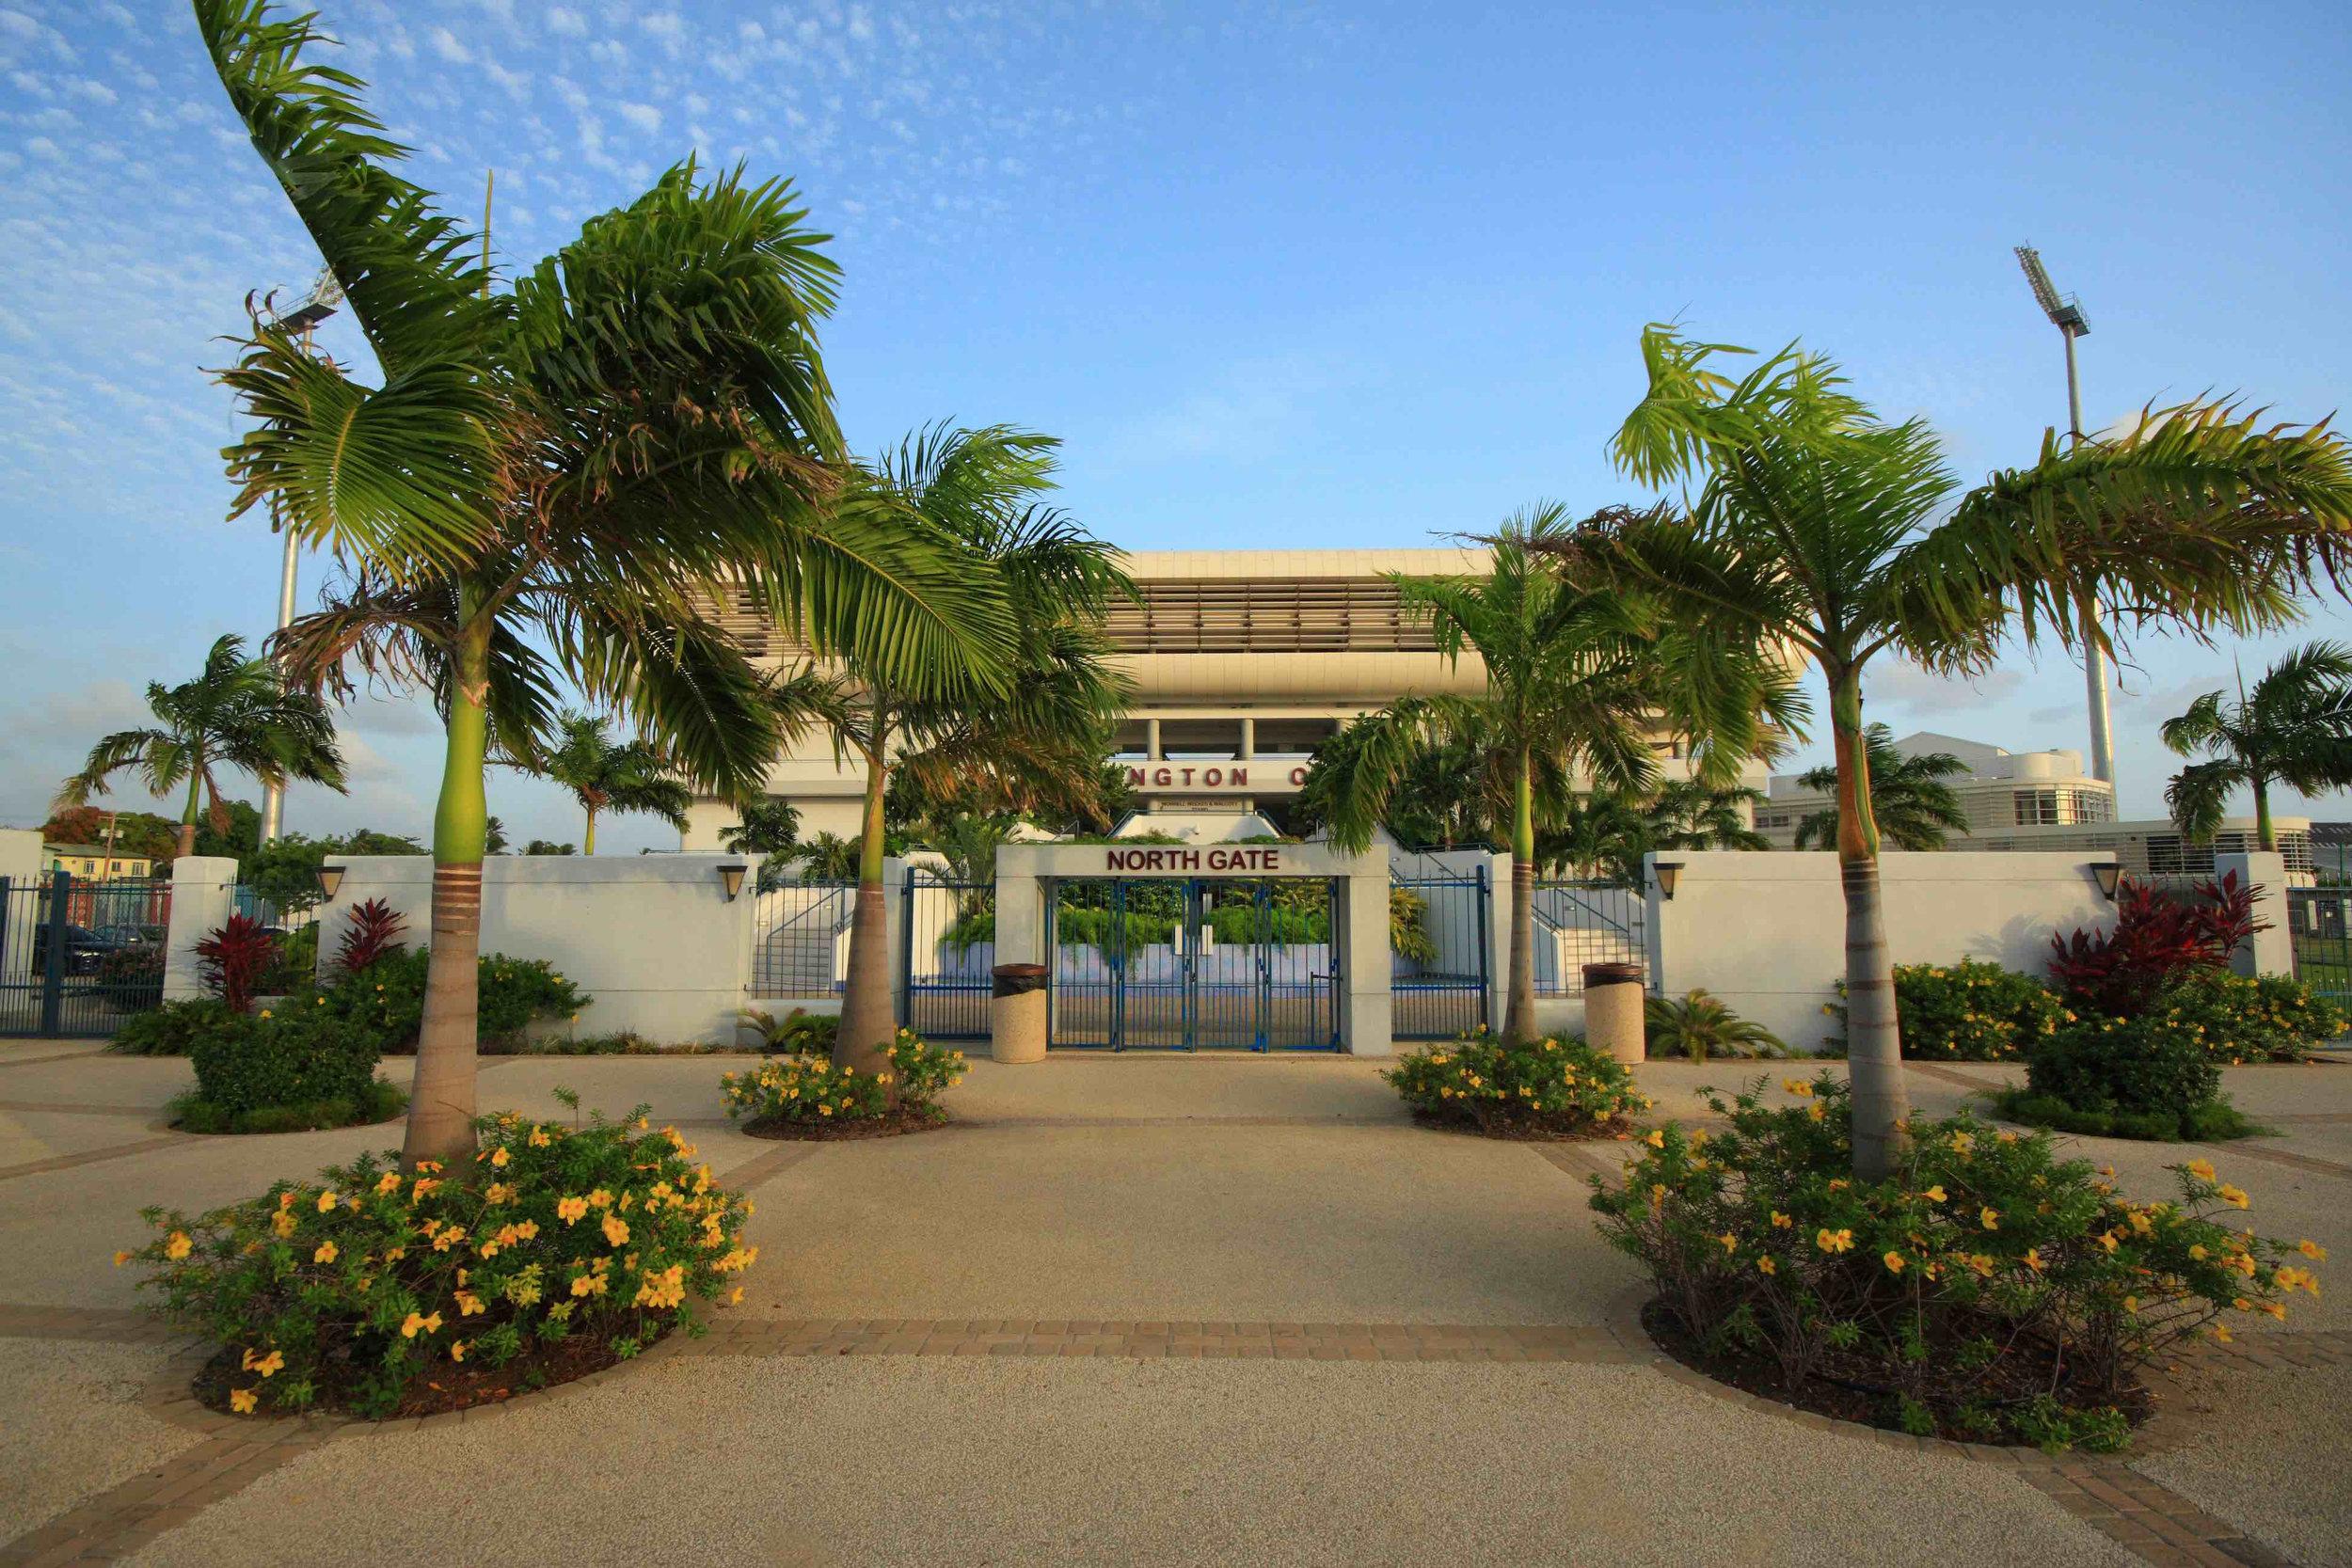 Kensington Oval Barbados Cricket Field designed by landscape architect andre kelshall